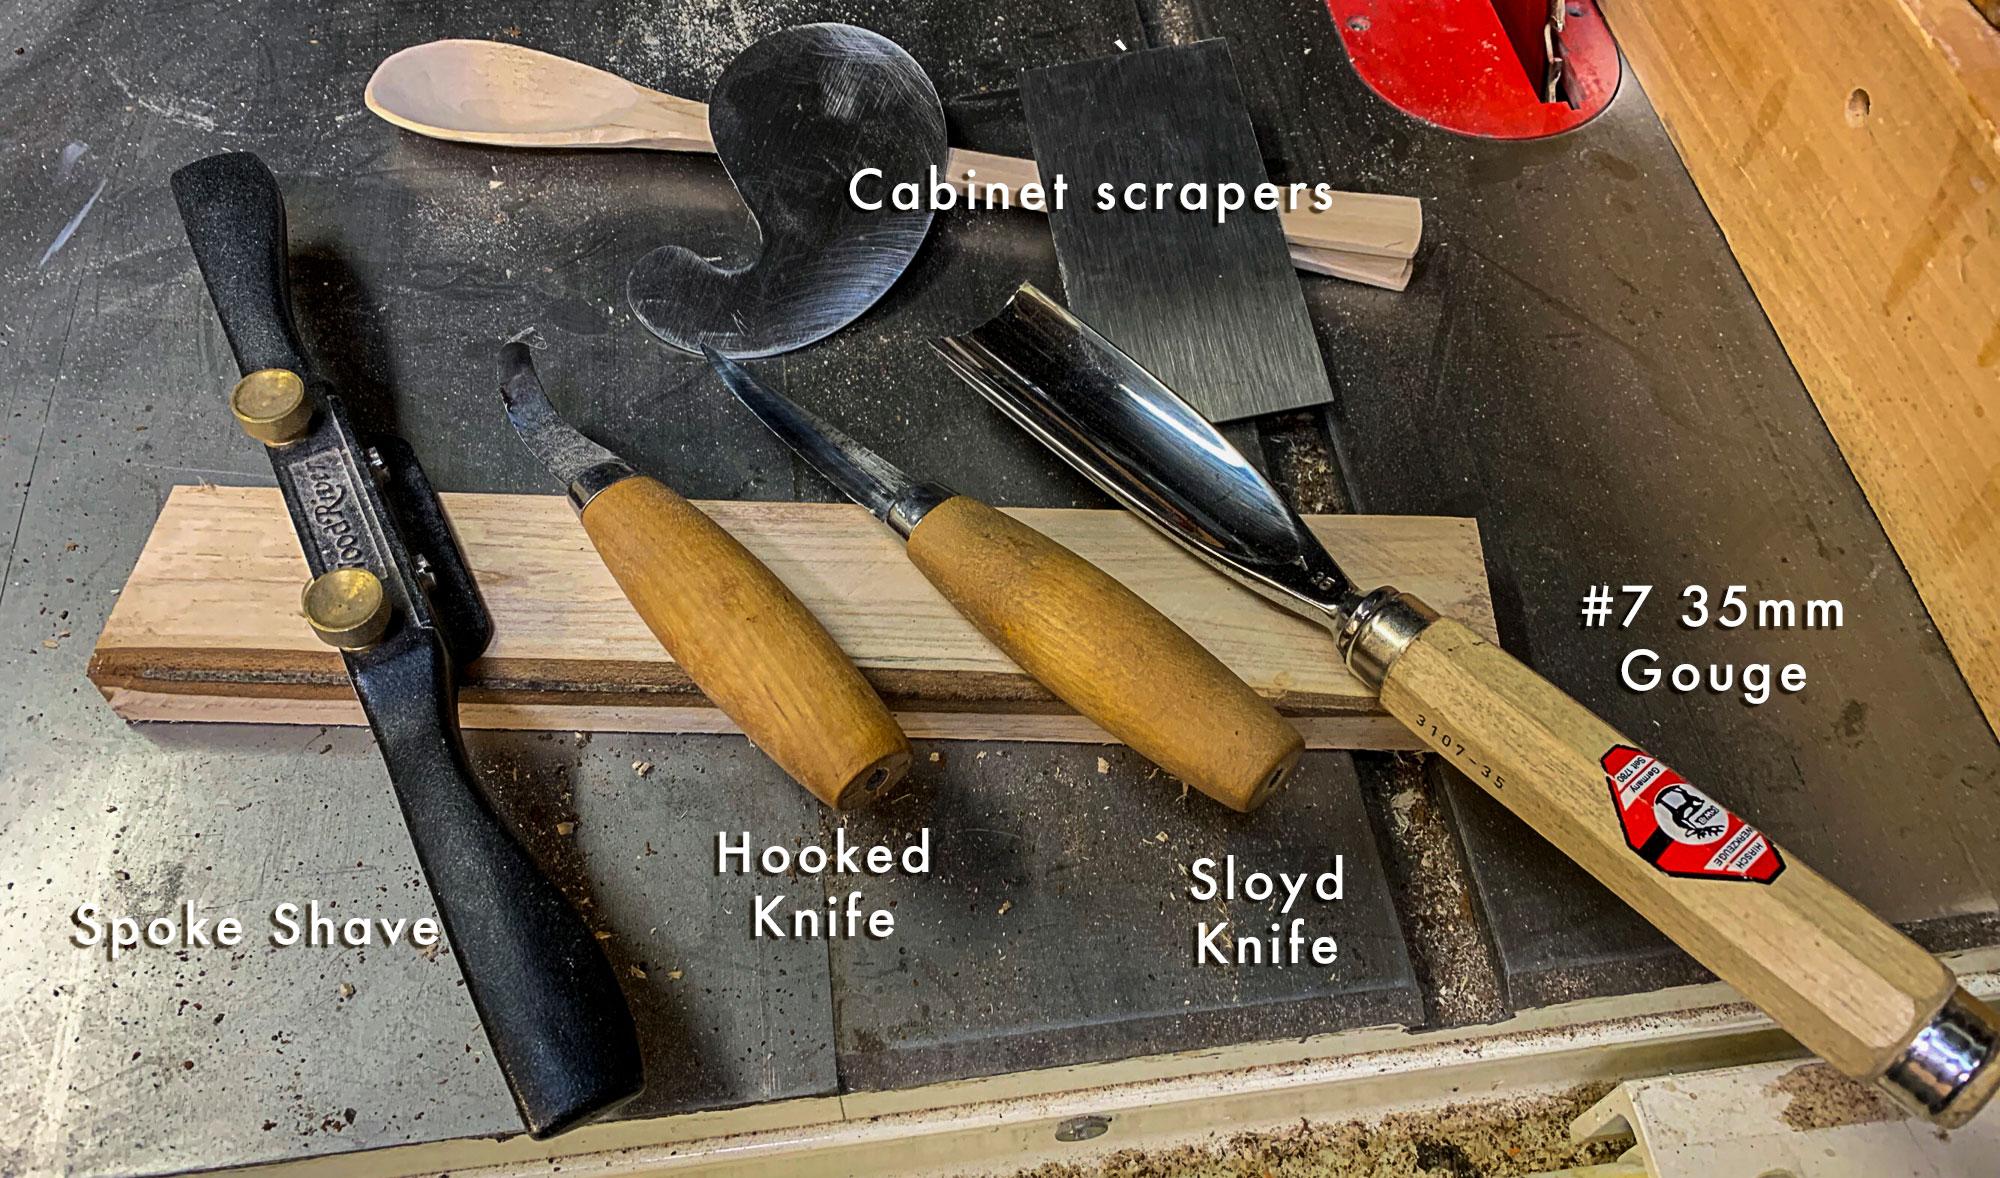 The tools I used